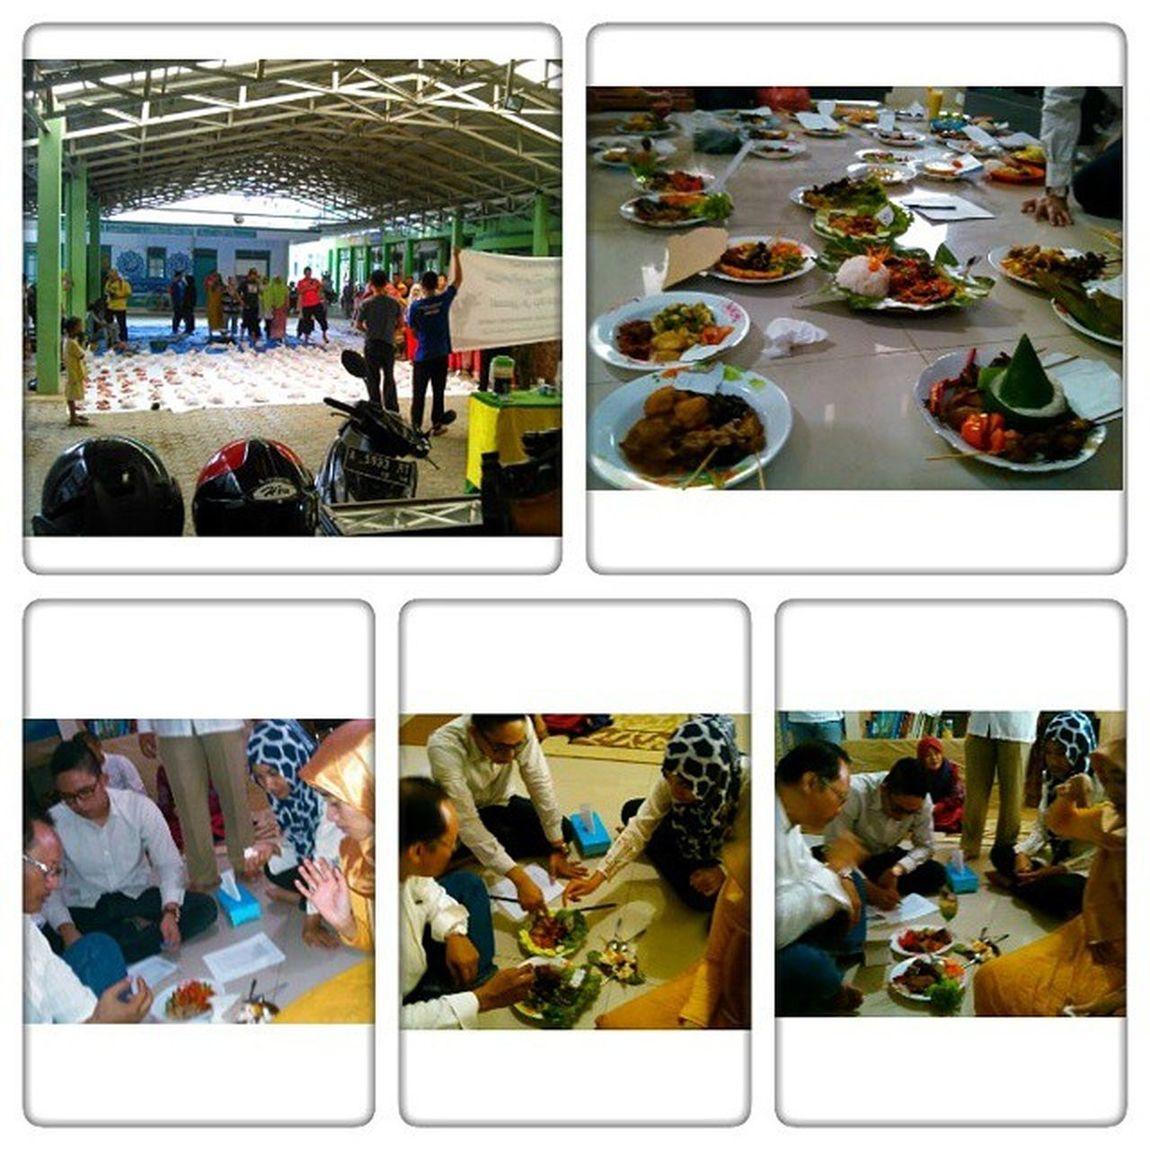 Pesantren daal al azhar Rangkasbitung Banten , merayakan Eid al adha sekaligus jadi juri tamu lomba masak antar kelas